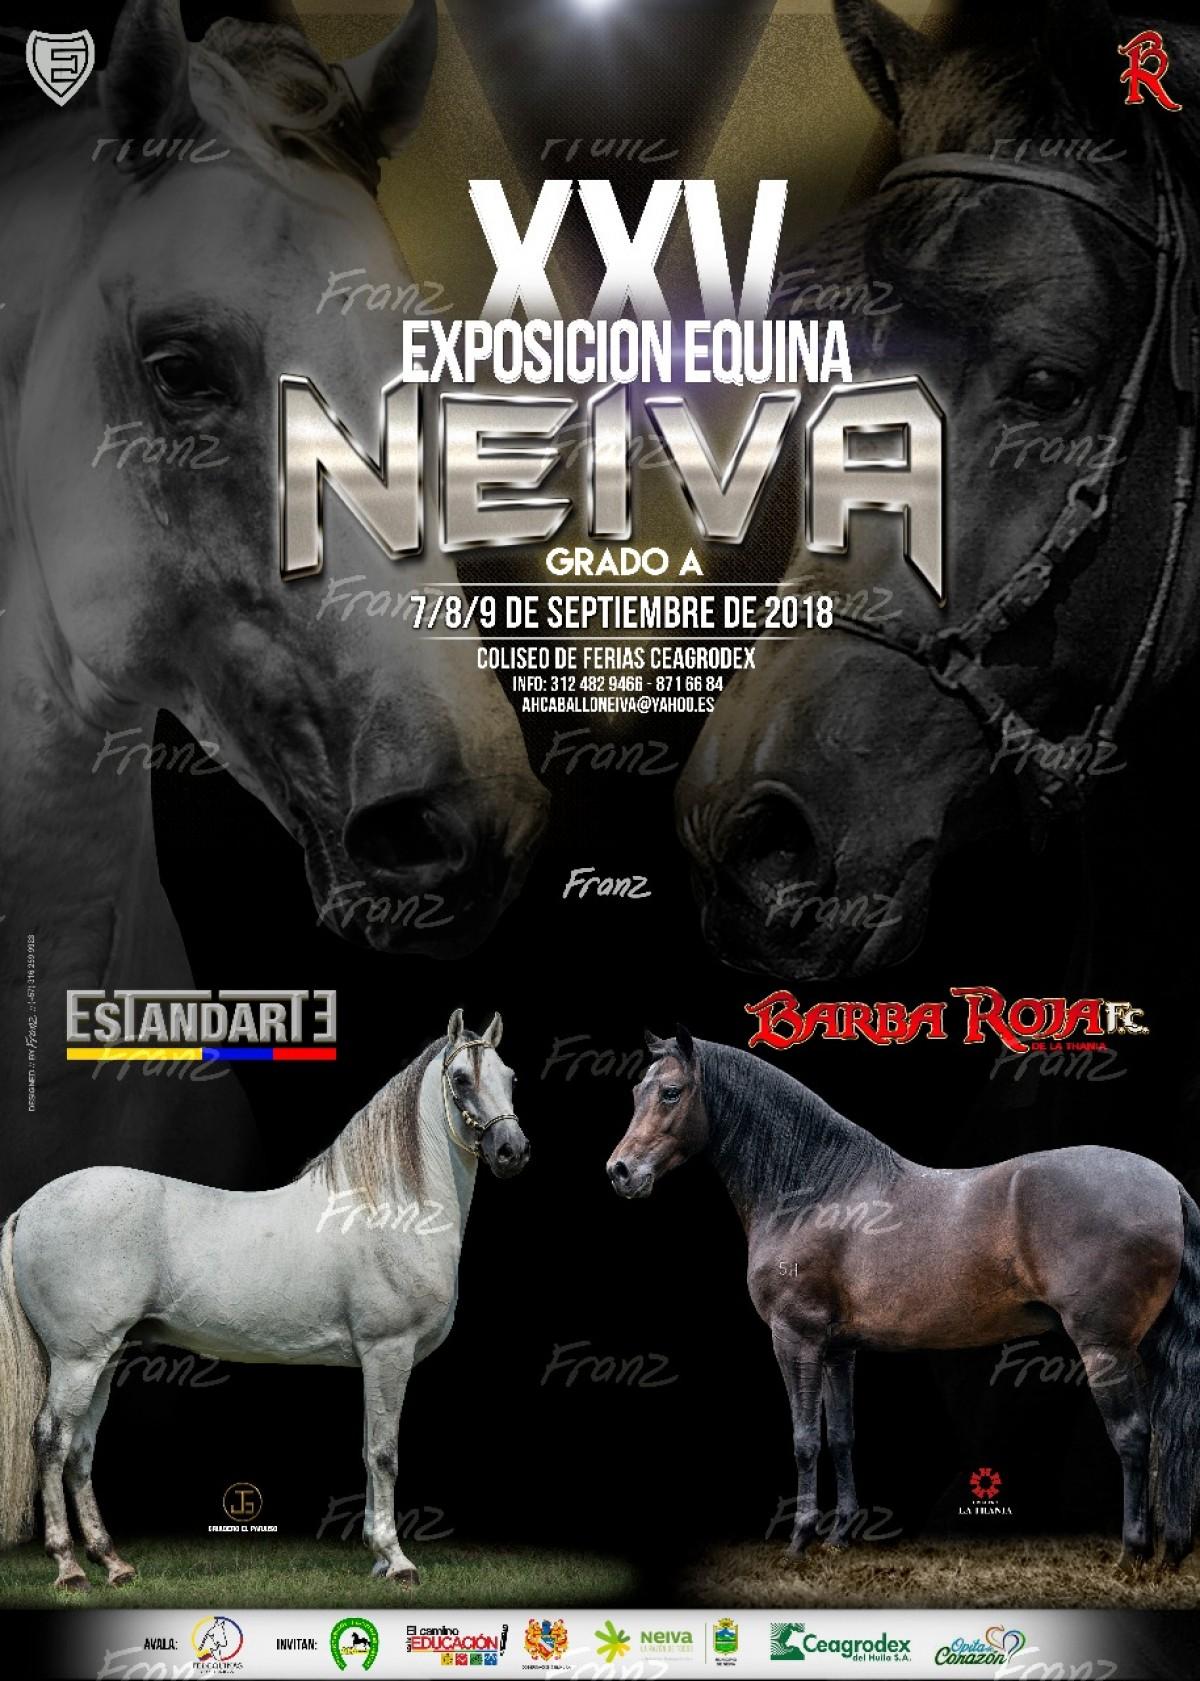 RESULTADOS XXV Exposición Equina Neiva Grado A 2018 - TROCHA COLOMBIANA